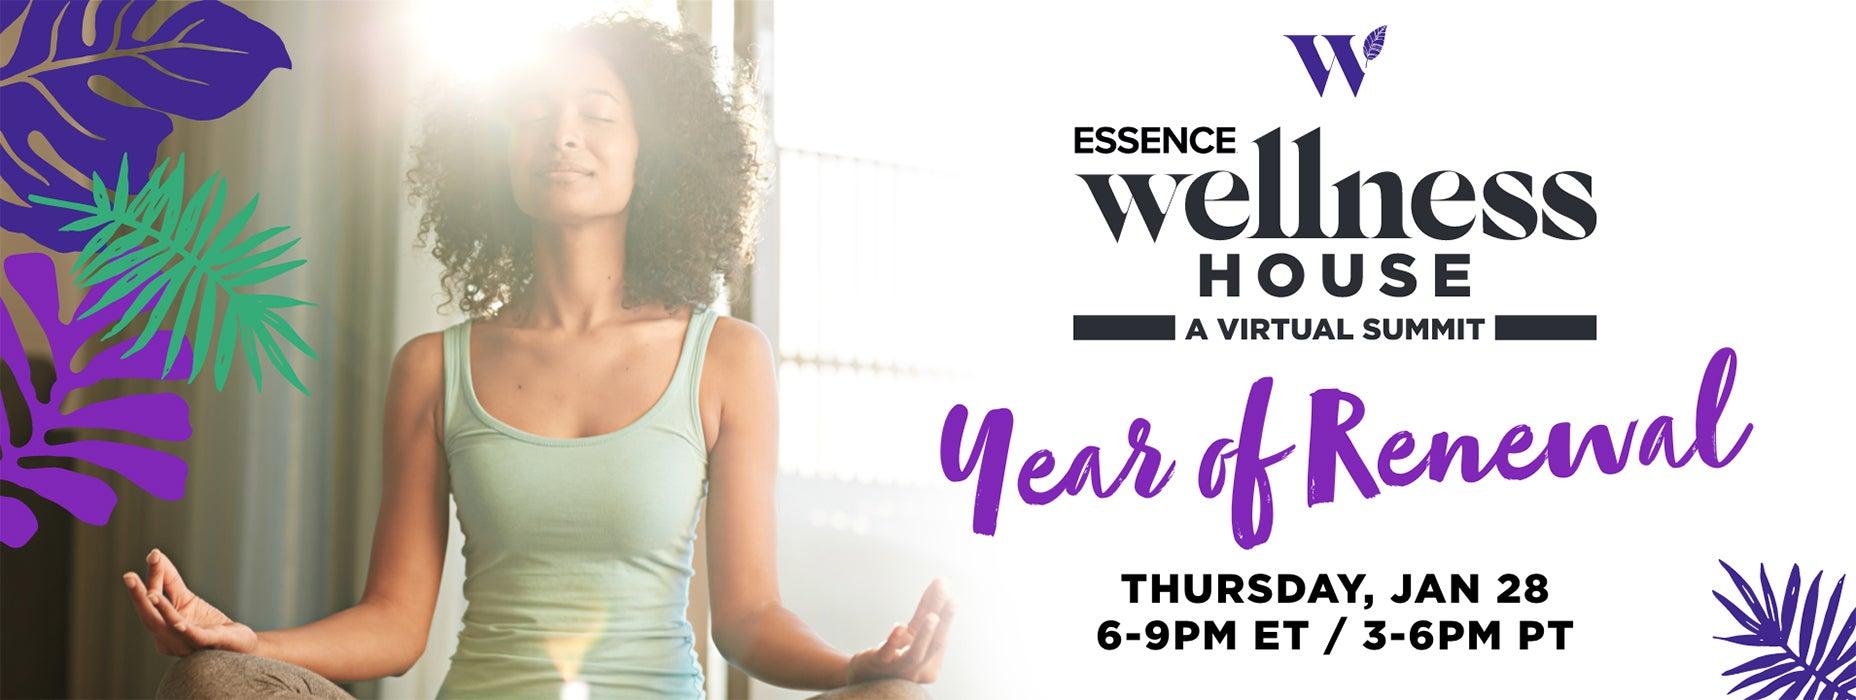 Essence Wellness House A Virtual Summit: Year of Renewal, Thursday january 28 6p-9p ET 3p-6p PT